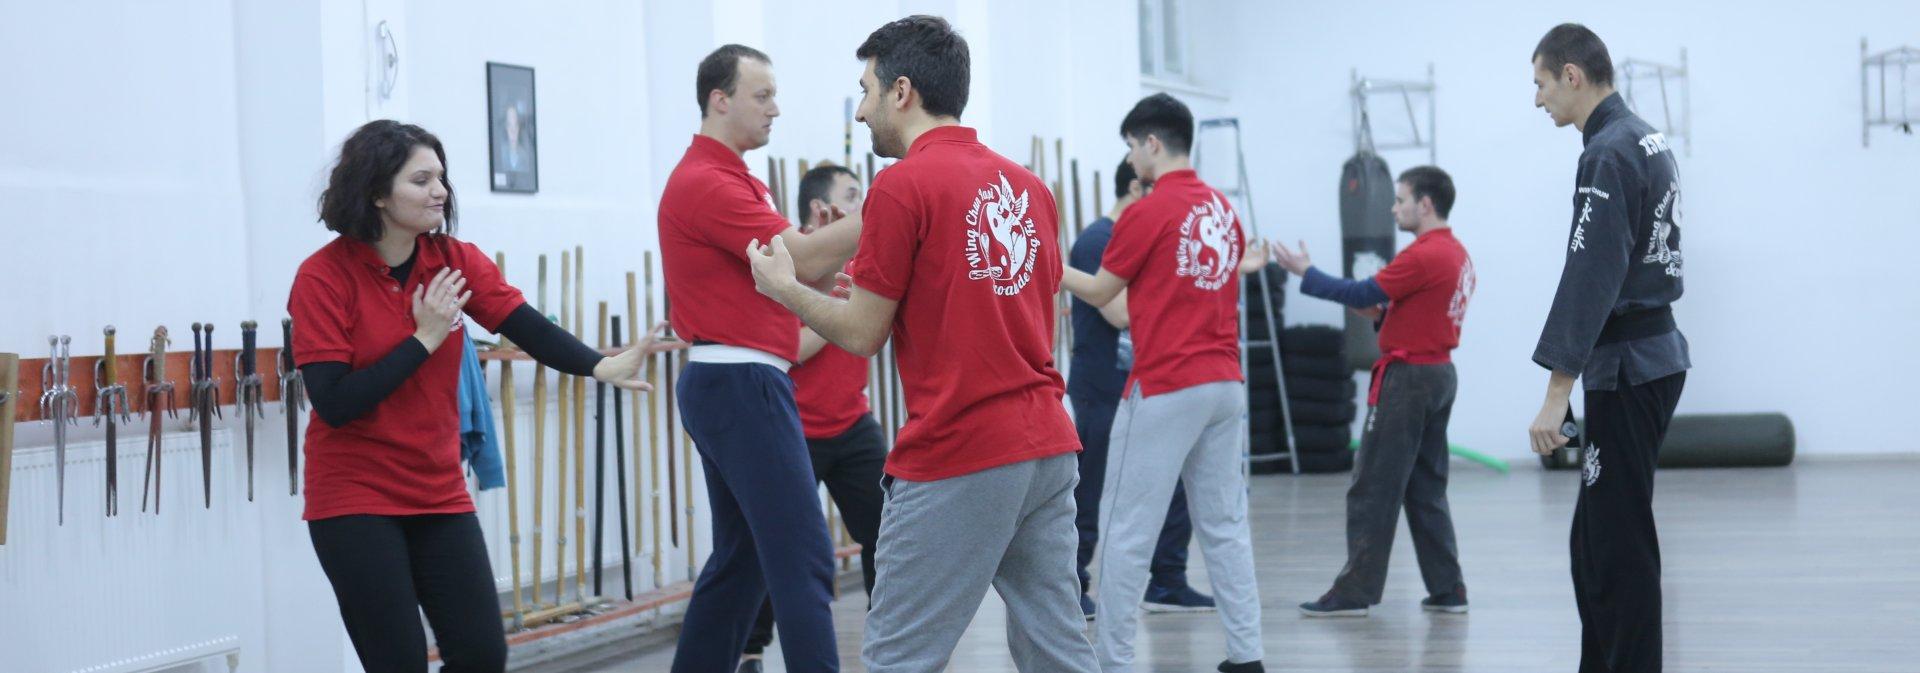 Școala de Kung Fu Ving Tsun (Nicolina), Iași